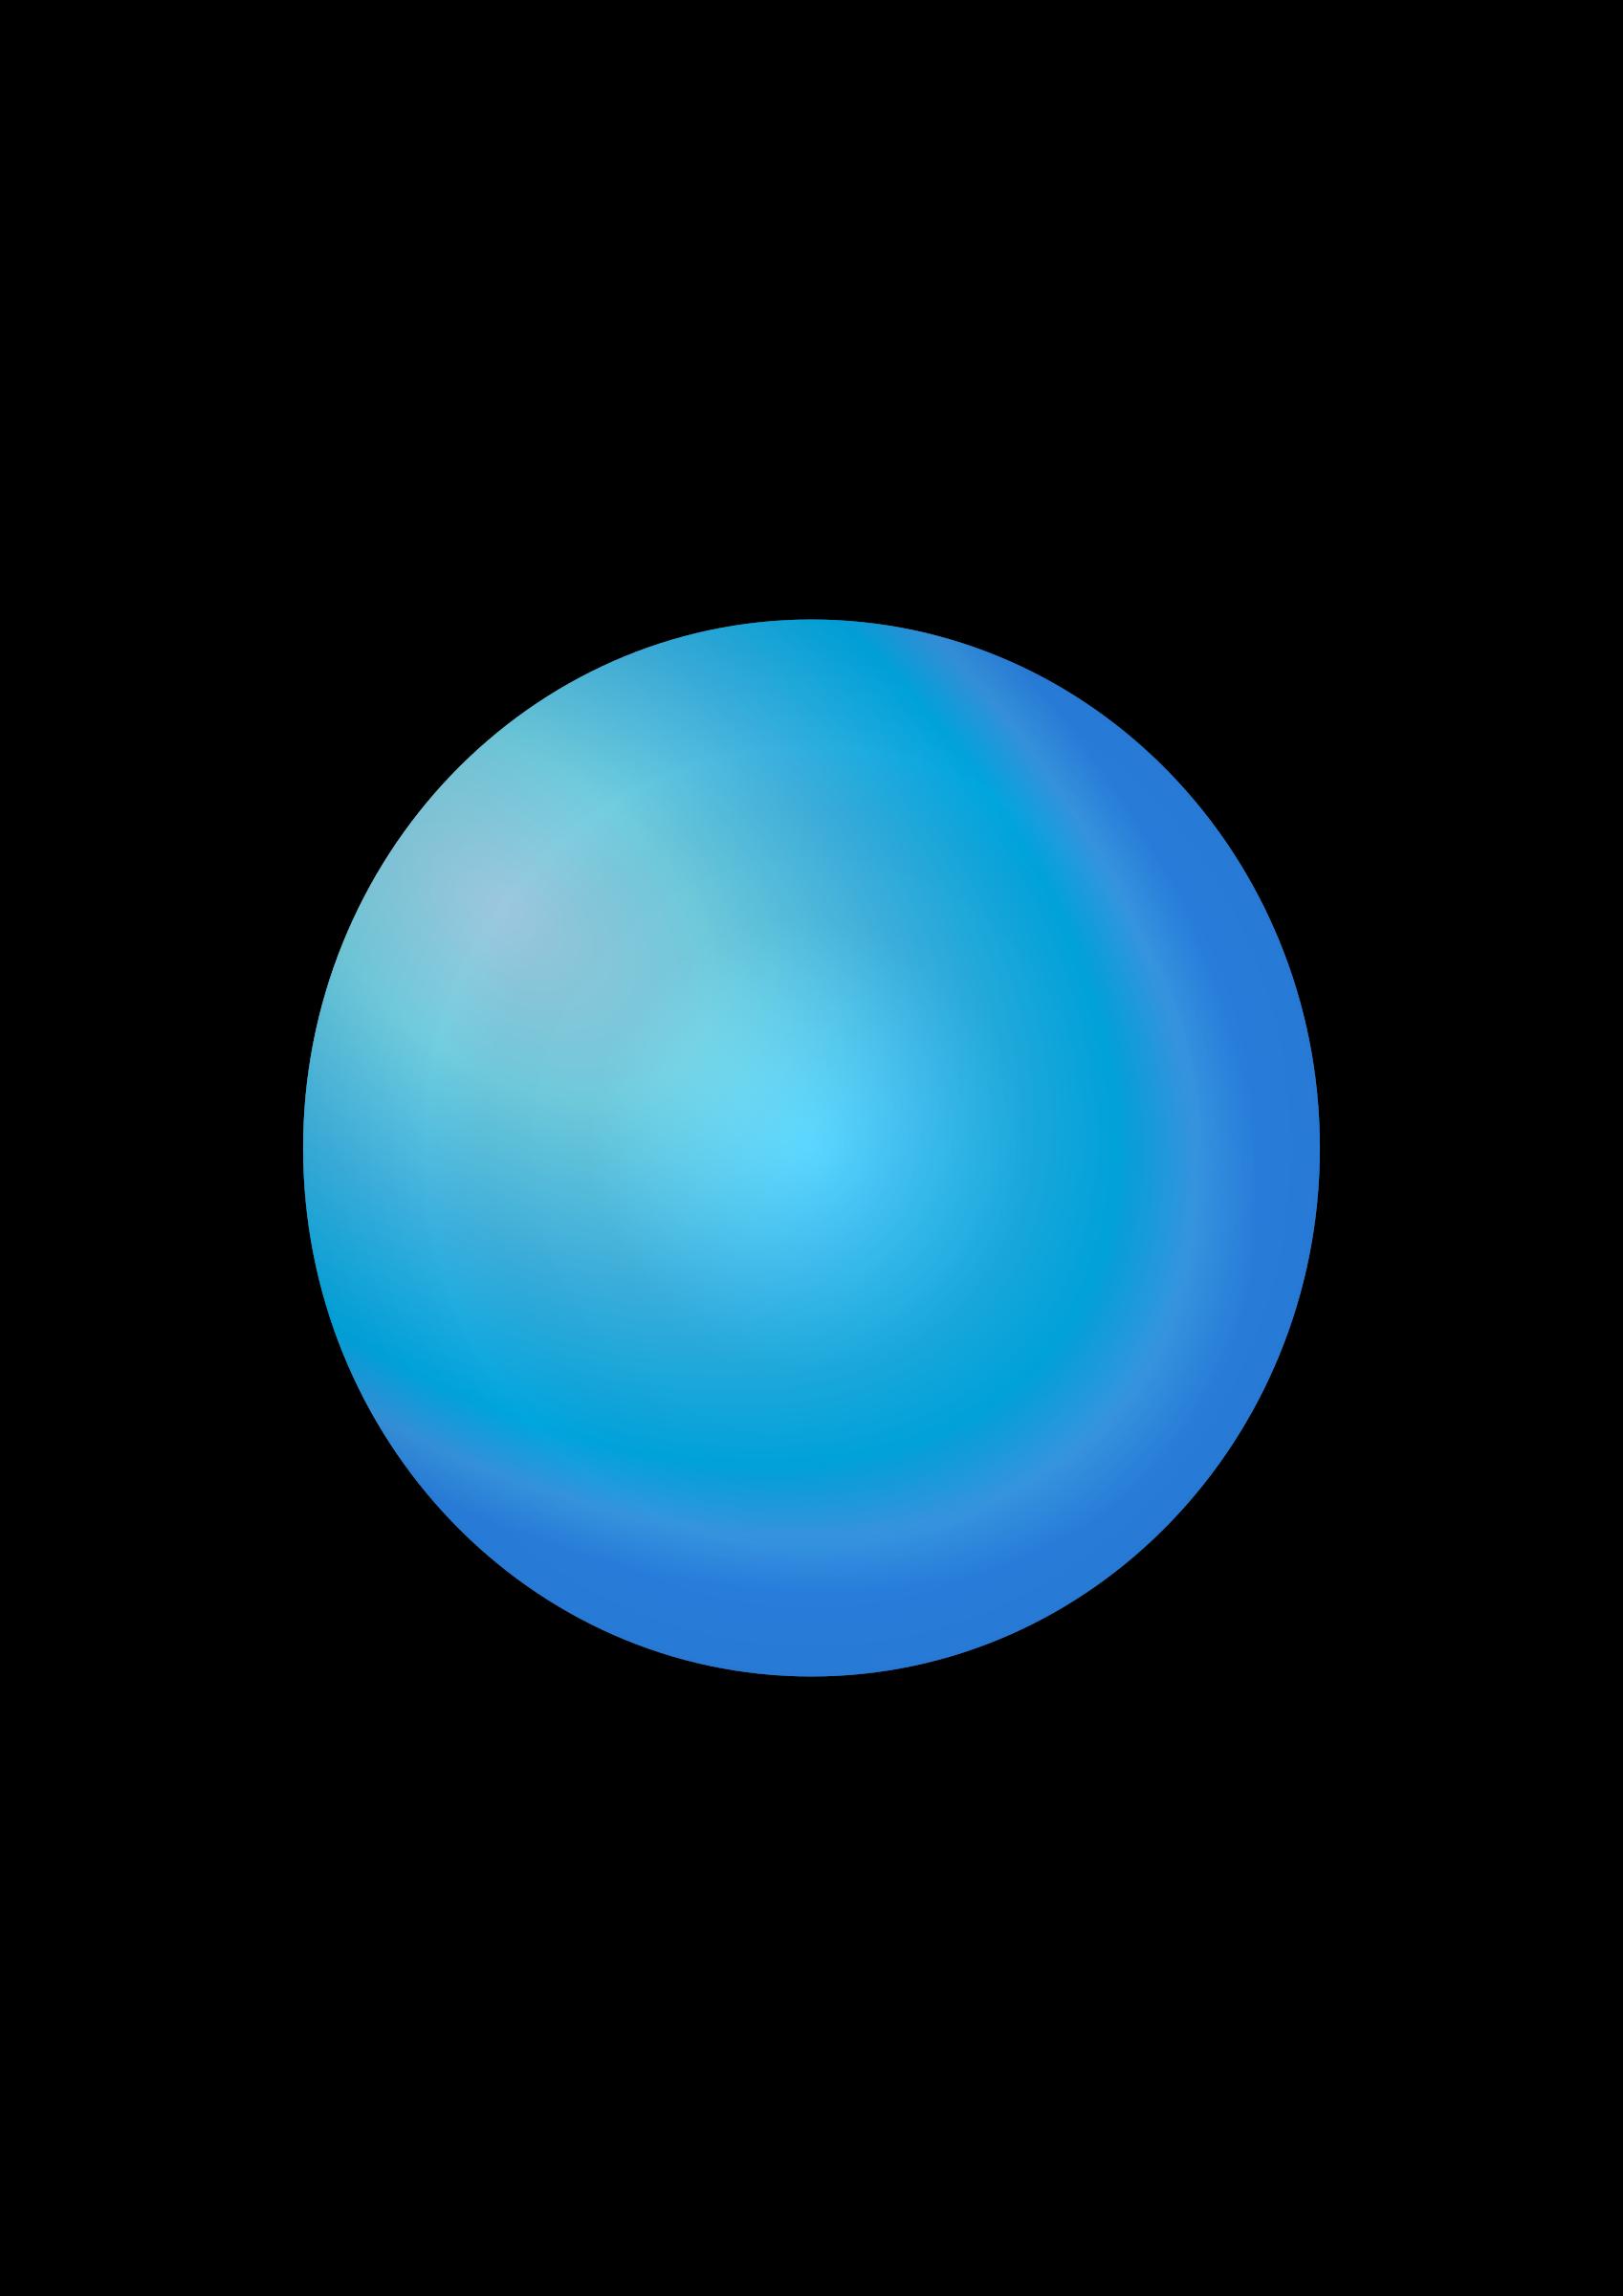 My planet big image. Planeten clipart uranus